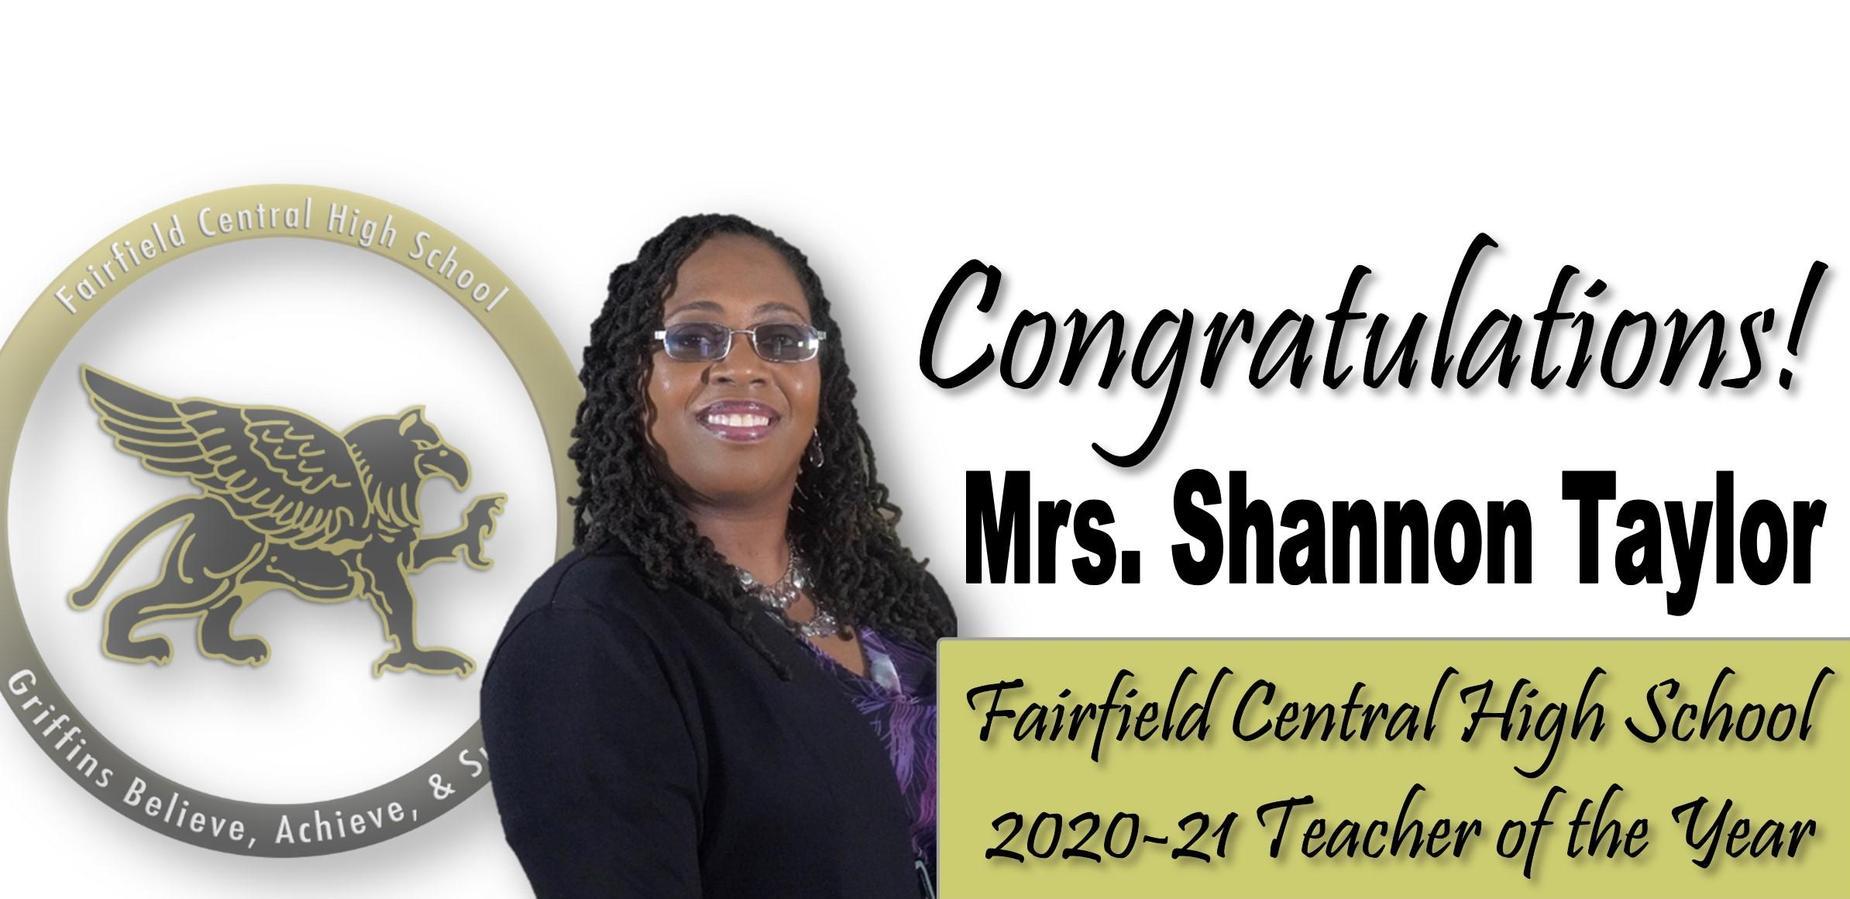 Congratulations Mrs. Shannon Taylor FCHS 2020-21 Teacher of the Year